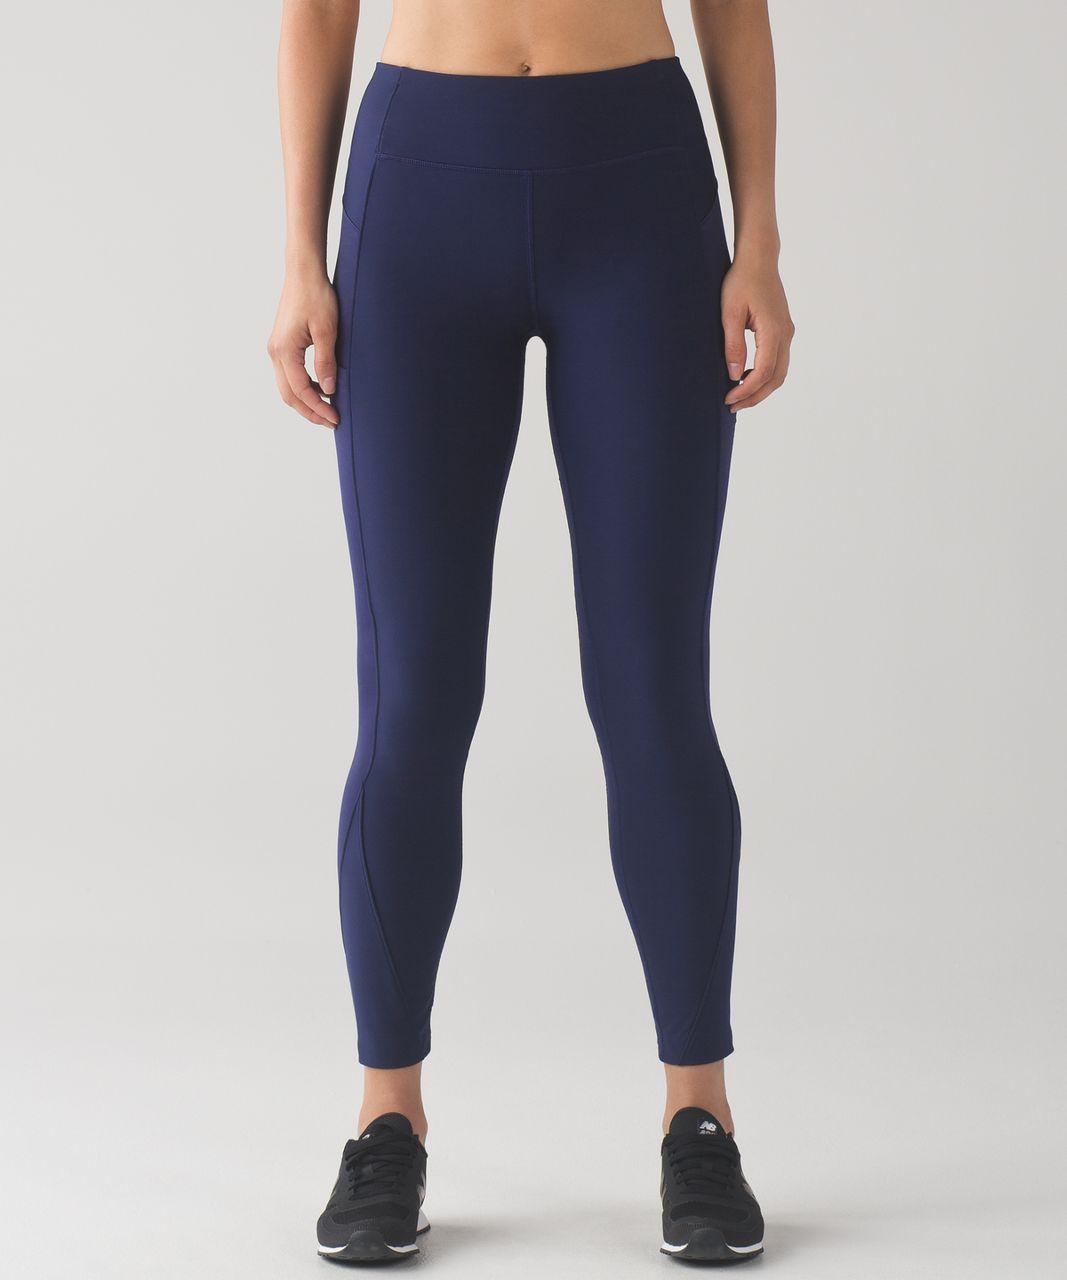 Lululemon Sleet Sprinter Tight - Hero Blue